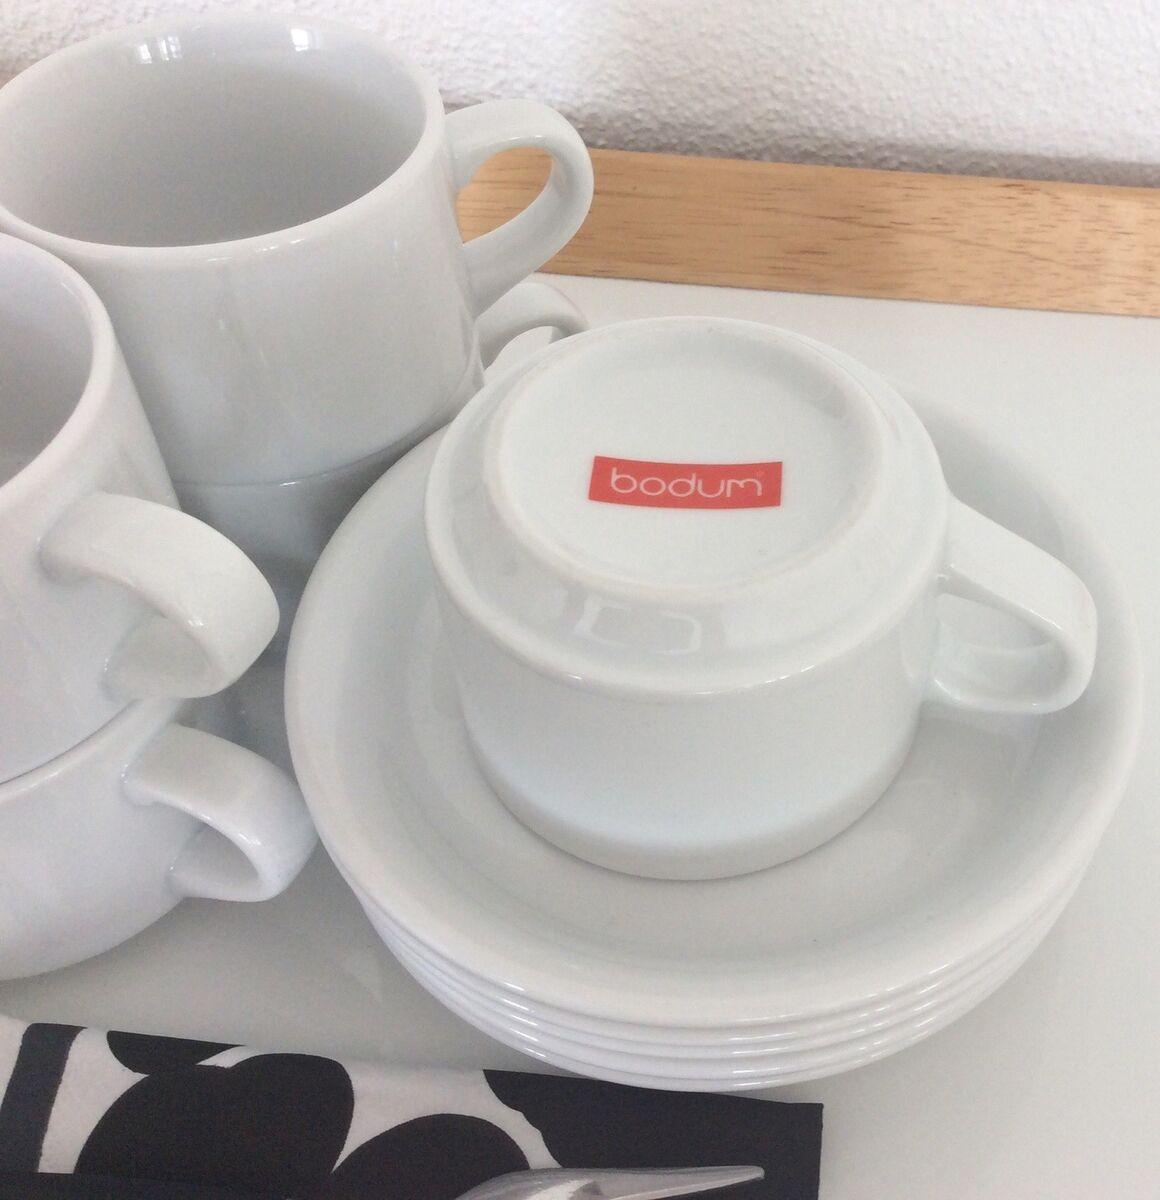 røde kaffekopper